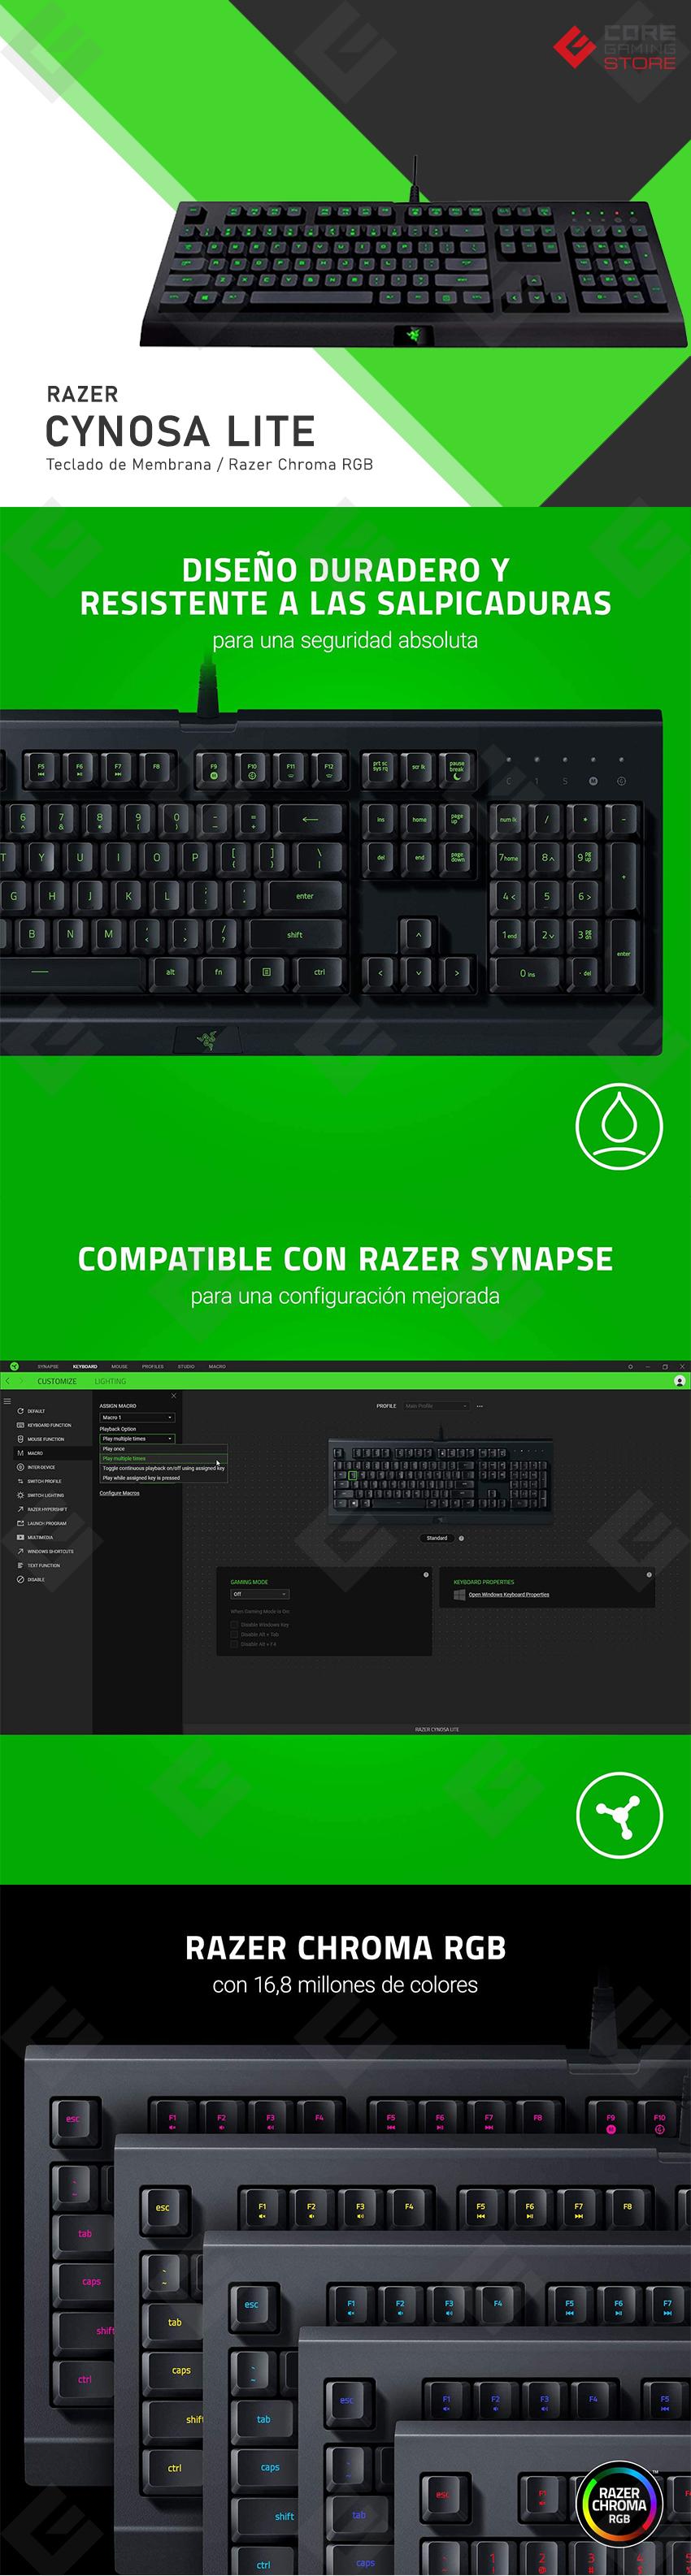 Teclado Gamer de Membrana Razer Cynosa Lite, Razer Chroma RGB, Español - RZ03-02741600-R311